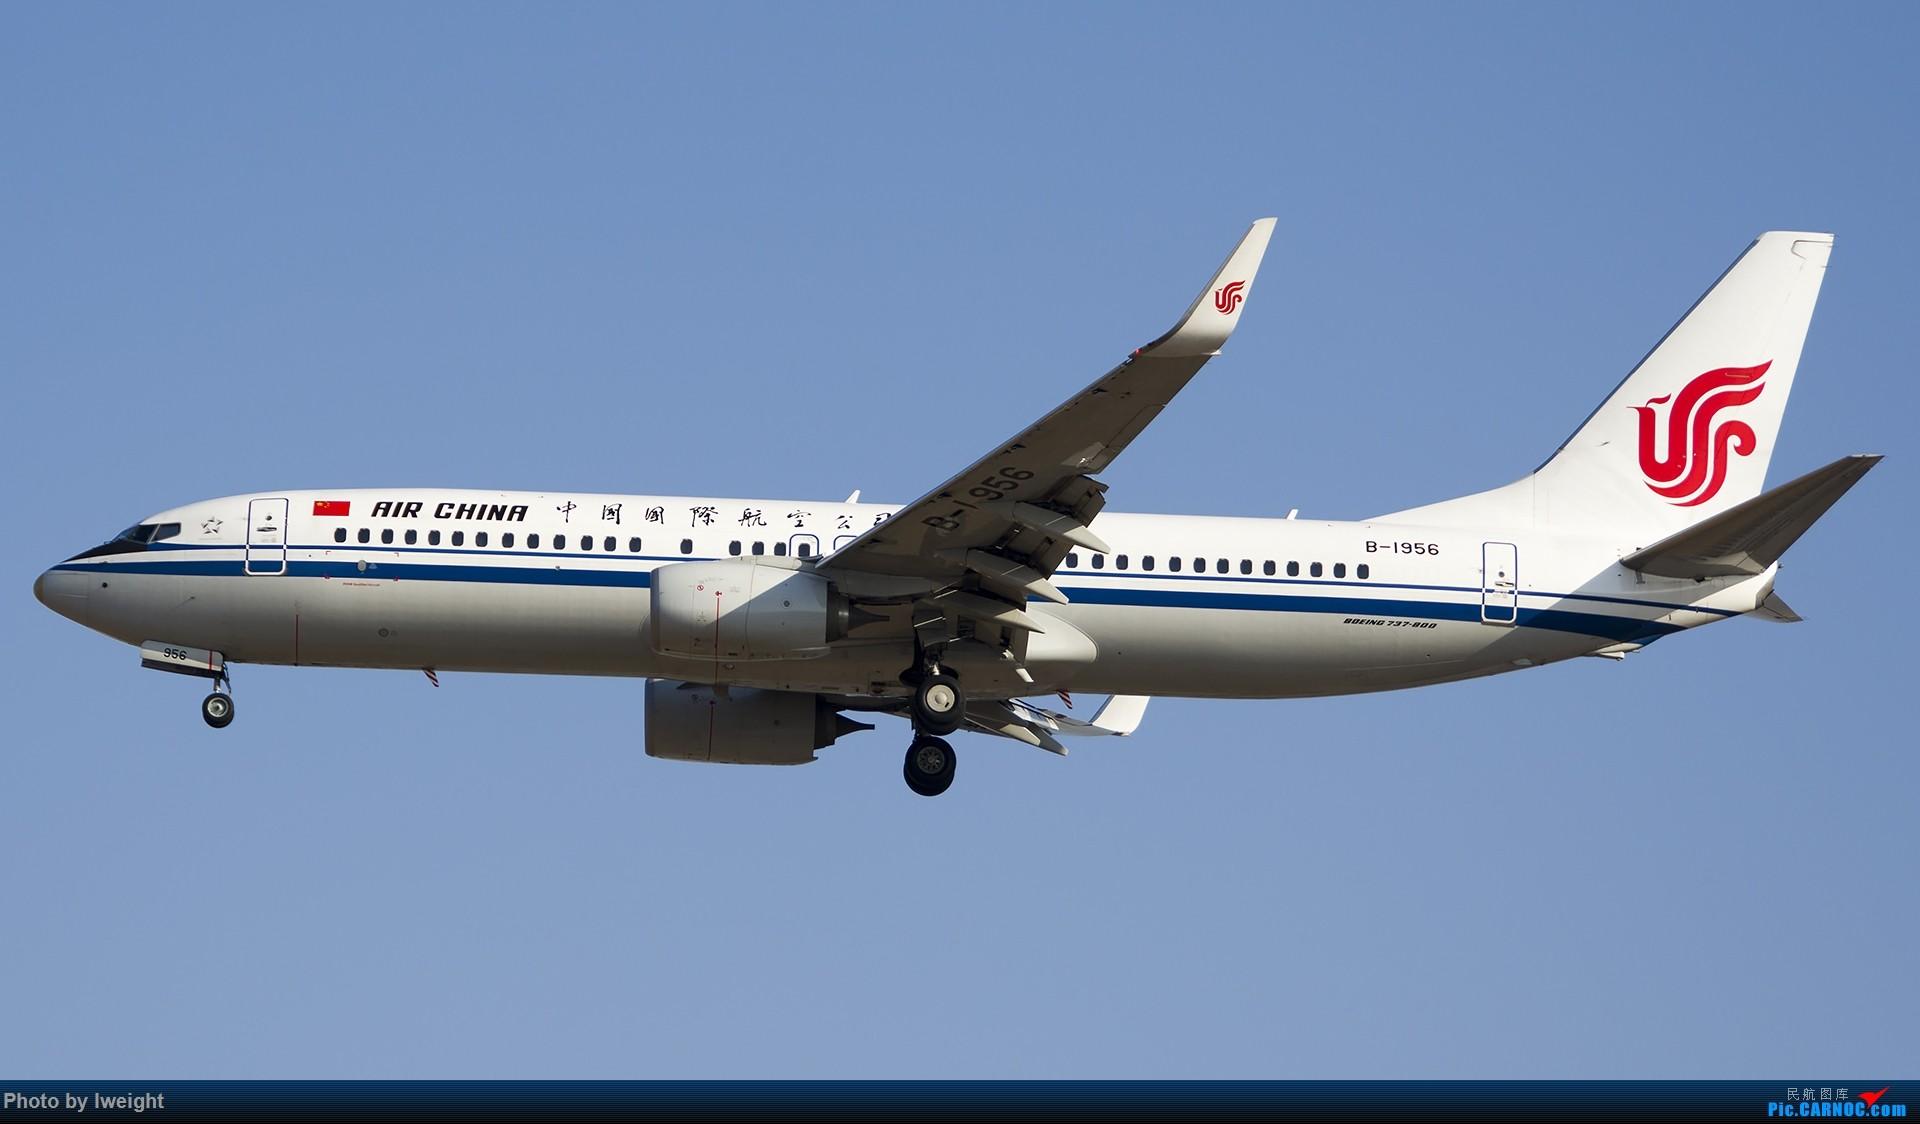 Re:[原创]庆祝升级777,发上今天在首都机场拍的所有飞机【2014-12-14】 BOEING 737-800 B-1956 中国北京首都国际机场